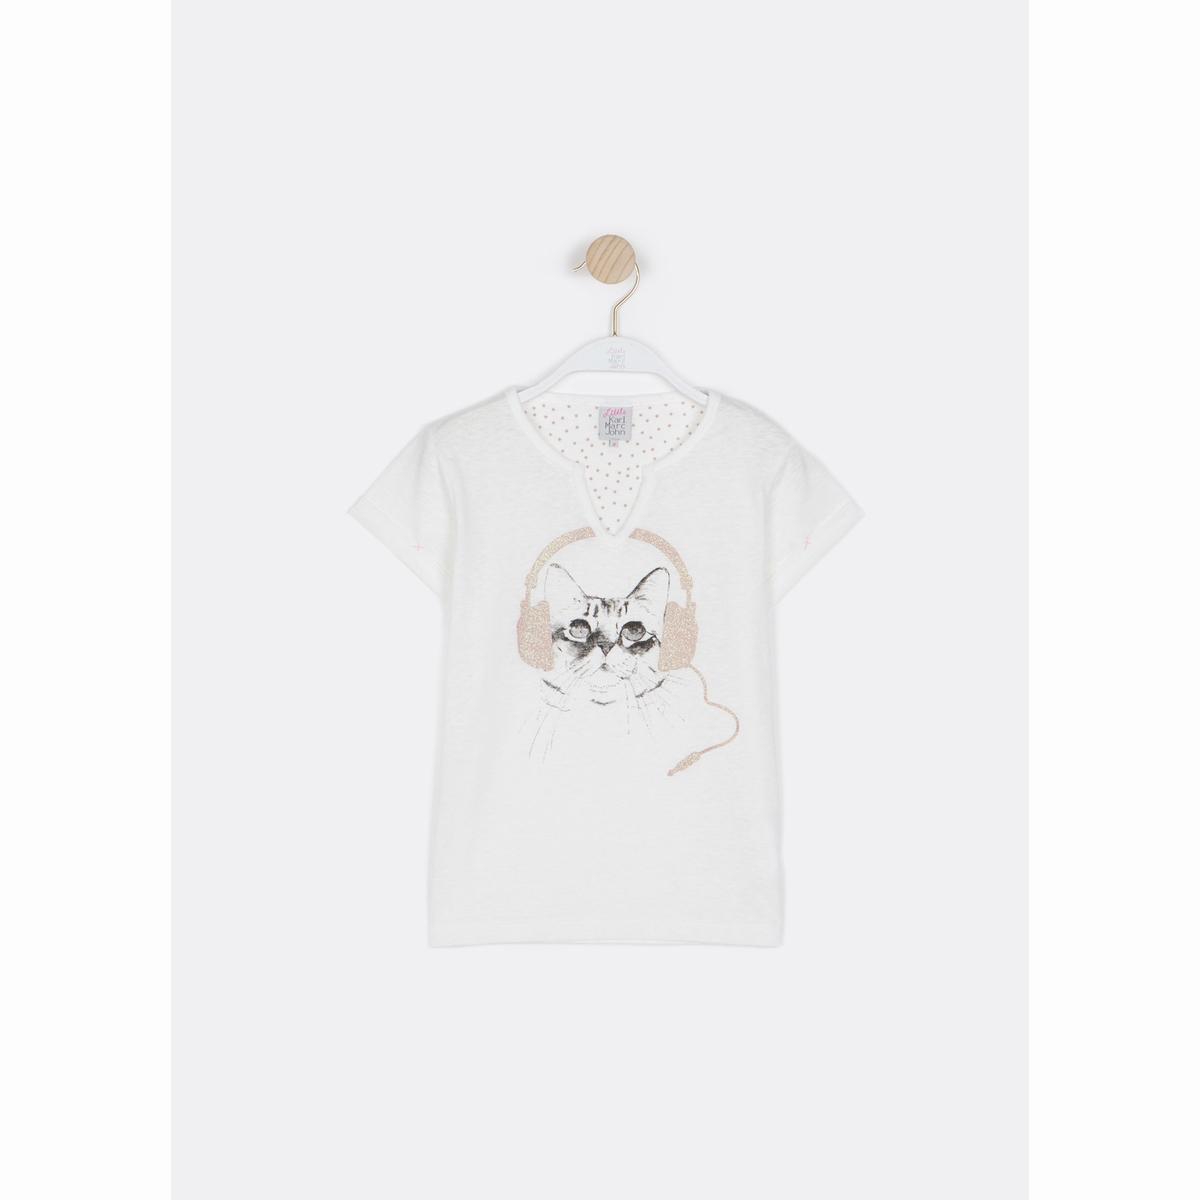 Футболка с рисунком кот, 100% хлопка, для 6 - 16 лет футболка с рисунком ананас 100% хлопка для от 1 месяца до 3 лет